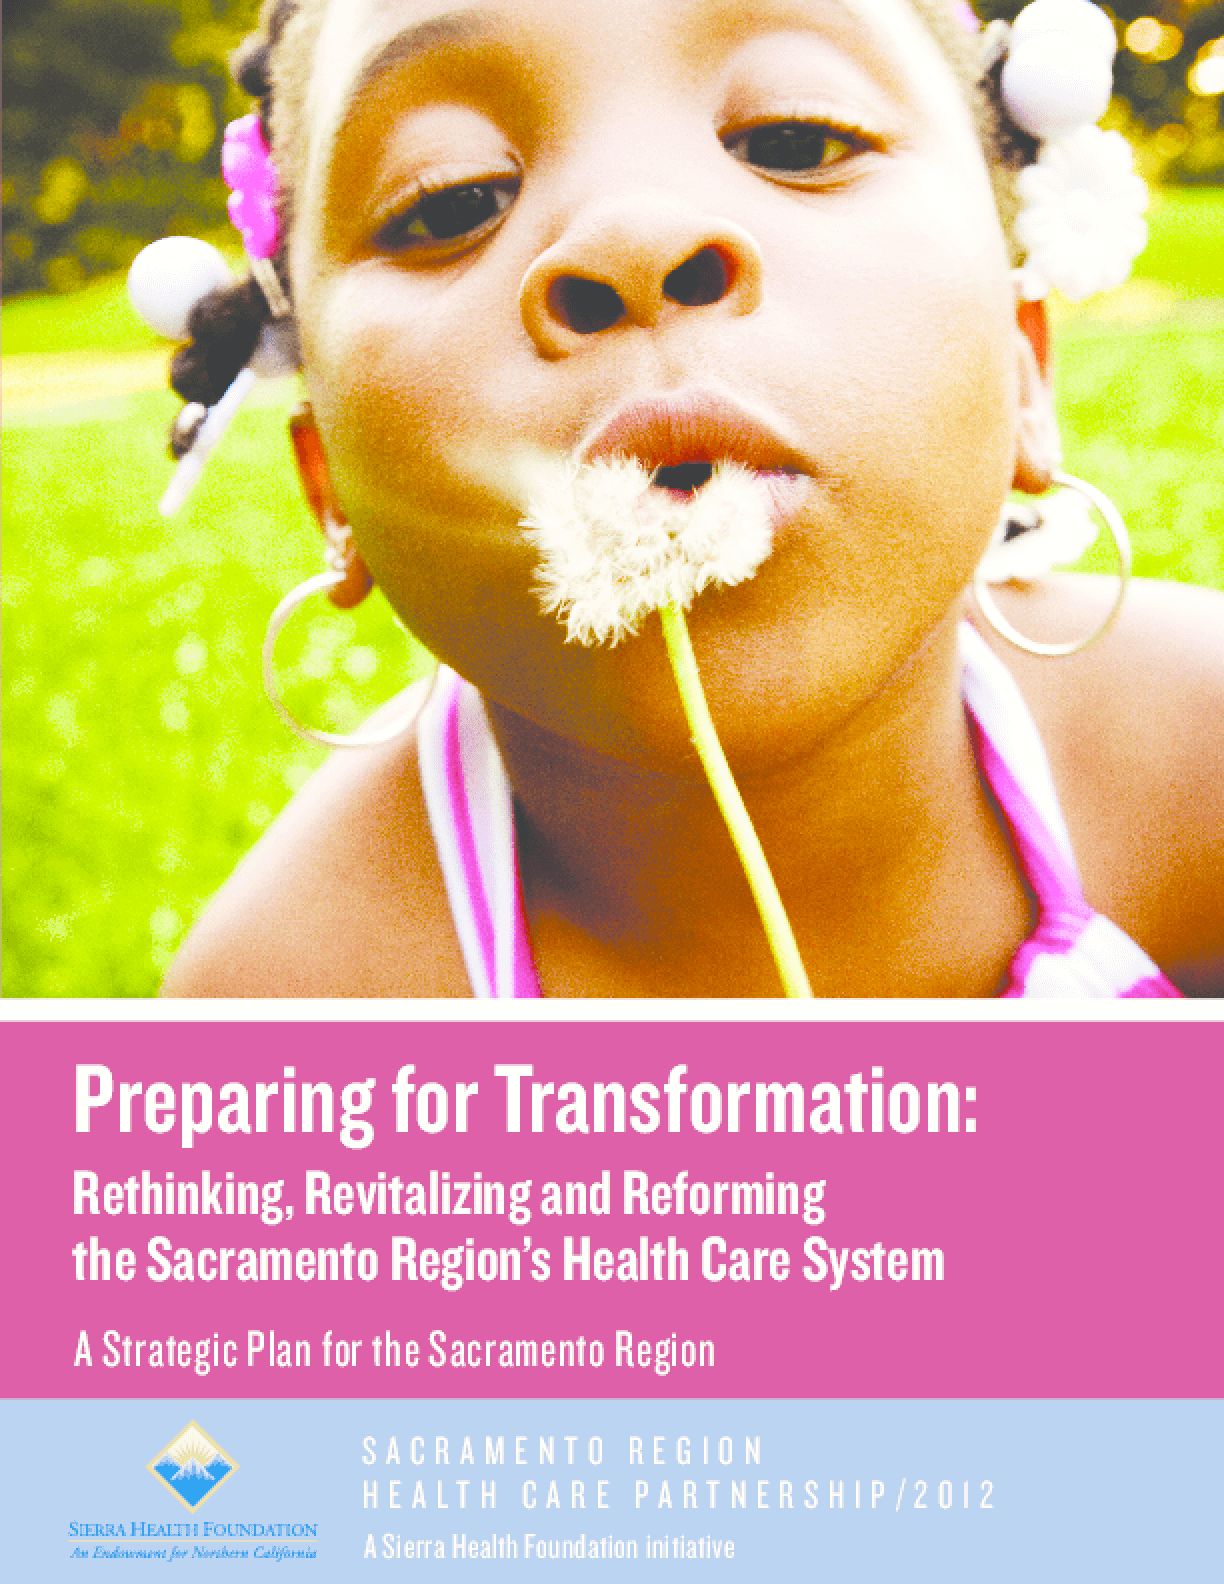 Preparing for Transformation: Rethinking, Revitalizing and Reforming the Sacramento Region's Health Care System - A Strategic Plan for the Sacramento Region